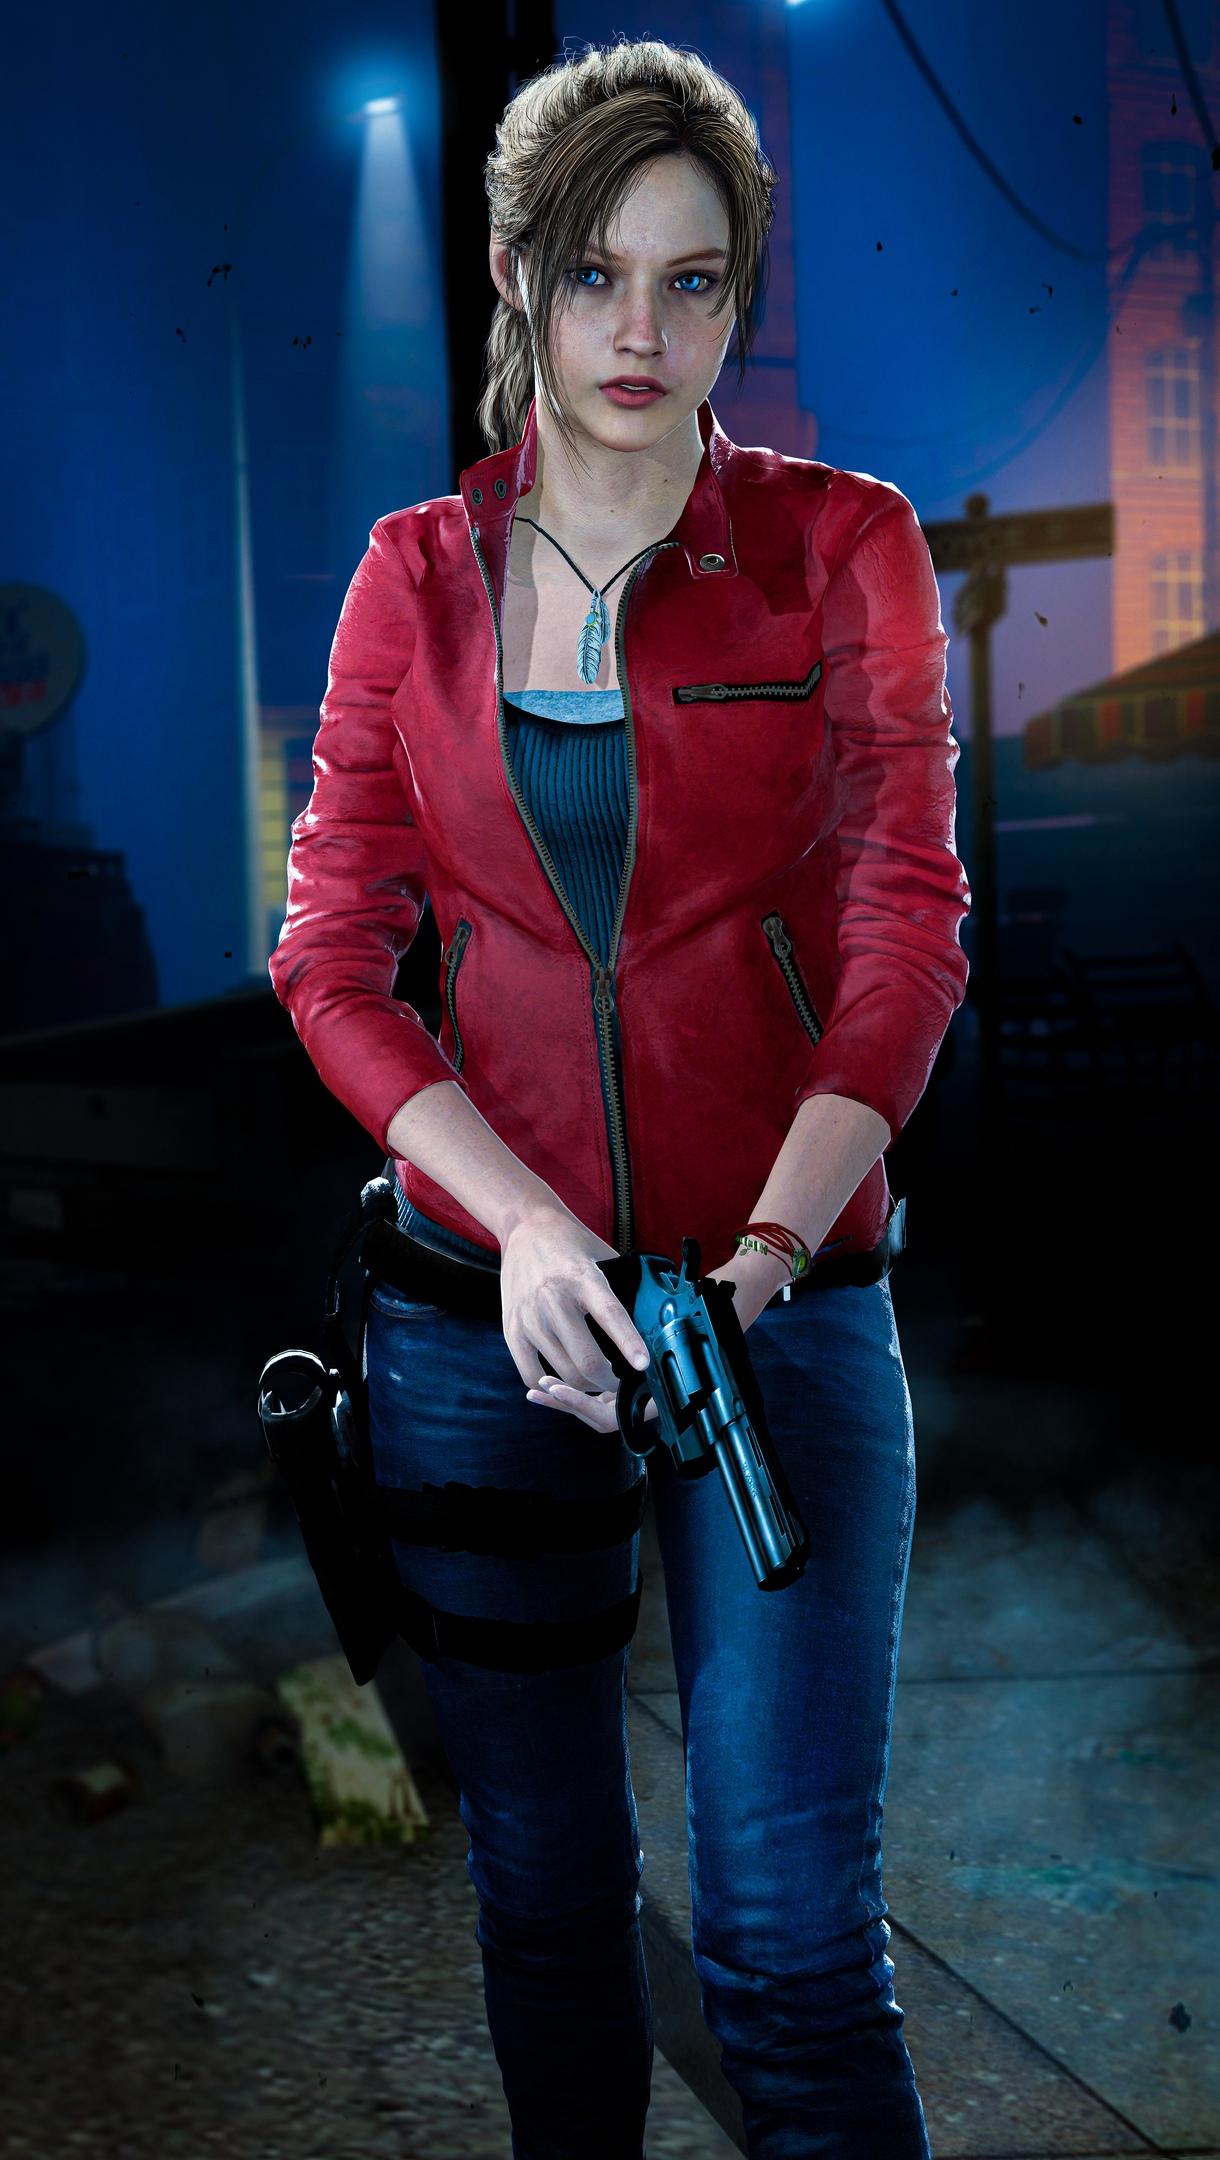 GDQljZeA-iI.jpg - Resident Evil 2 Клэр Редфилд